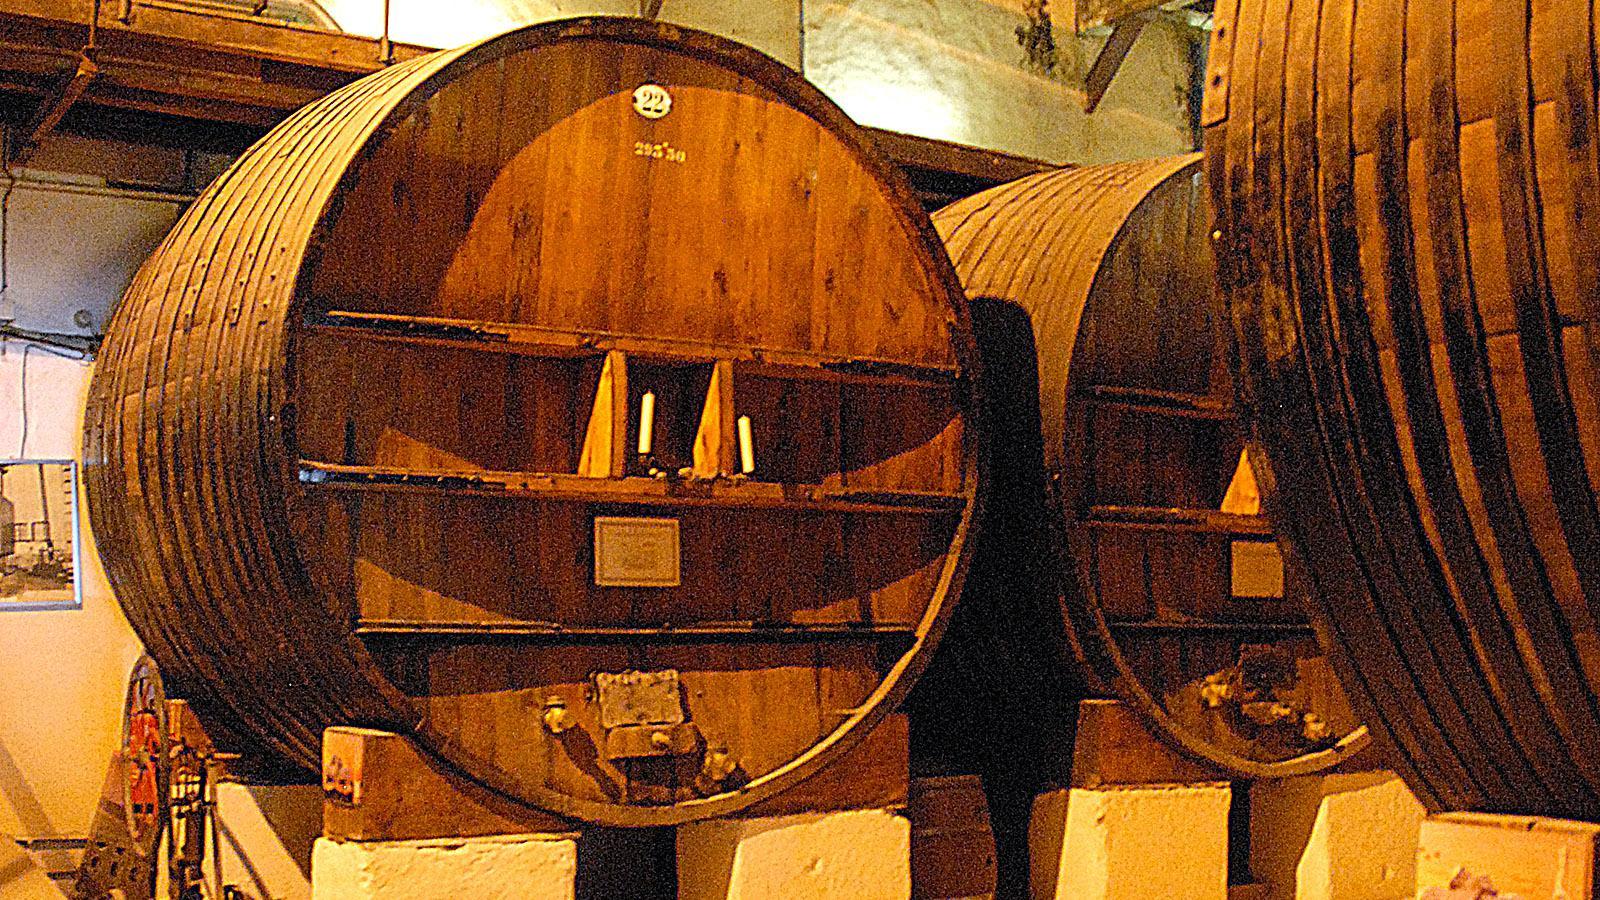 Visite de Cave bei Listel: Hier reift der Vin de Sable im Fass. Foto: Hilke Maunder